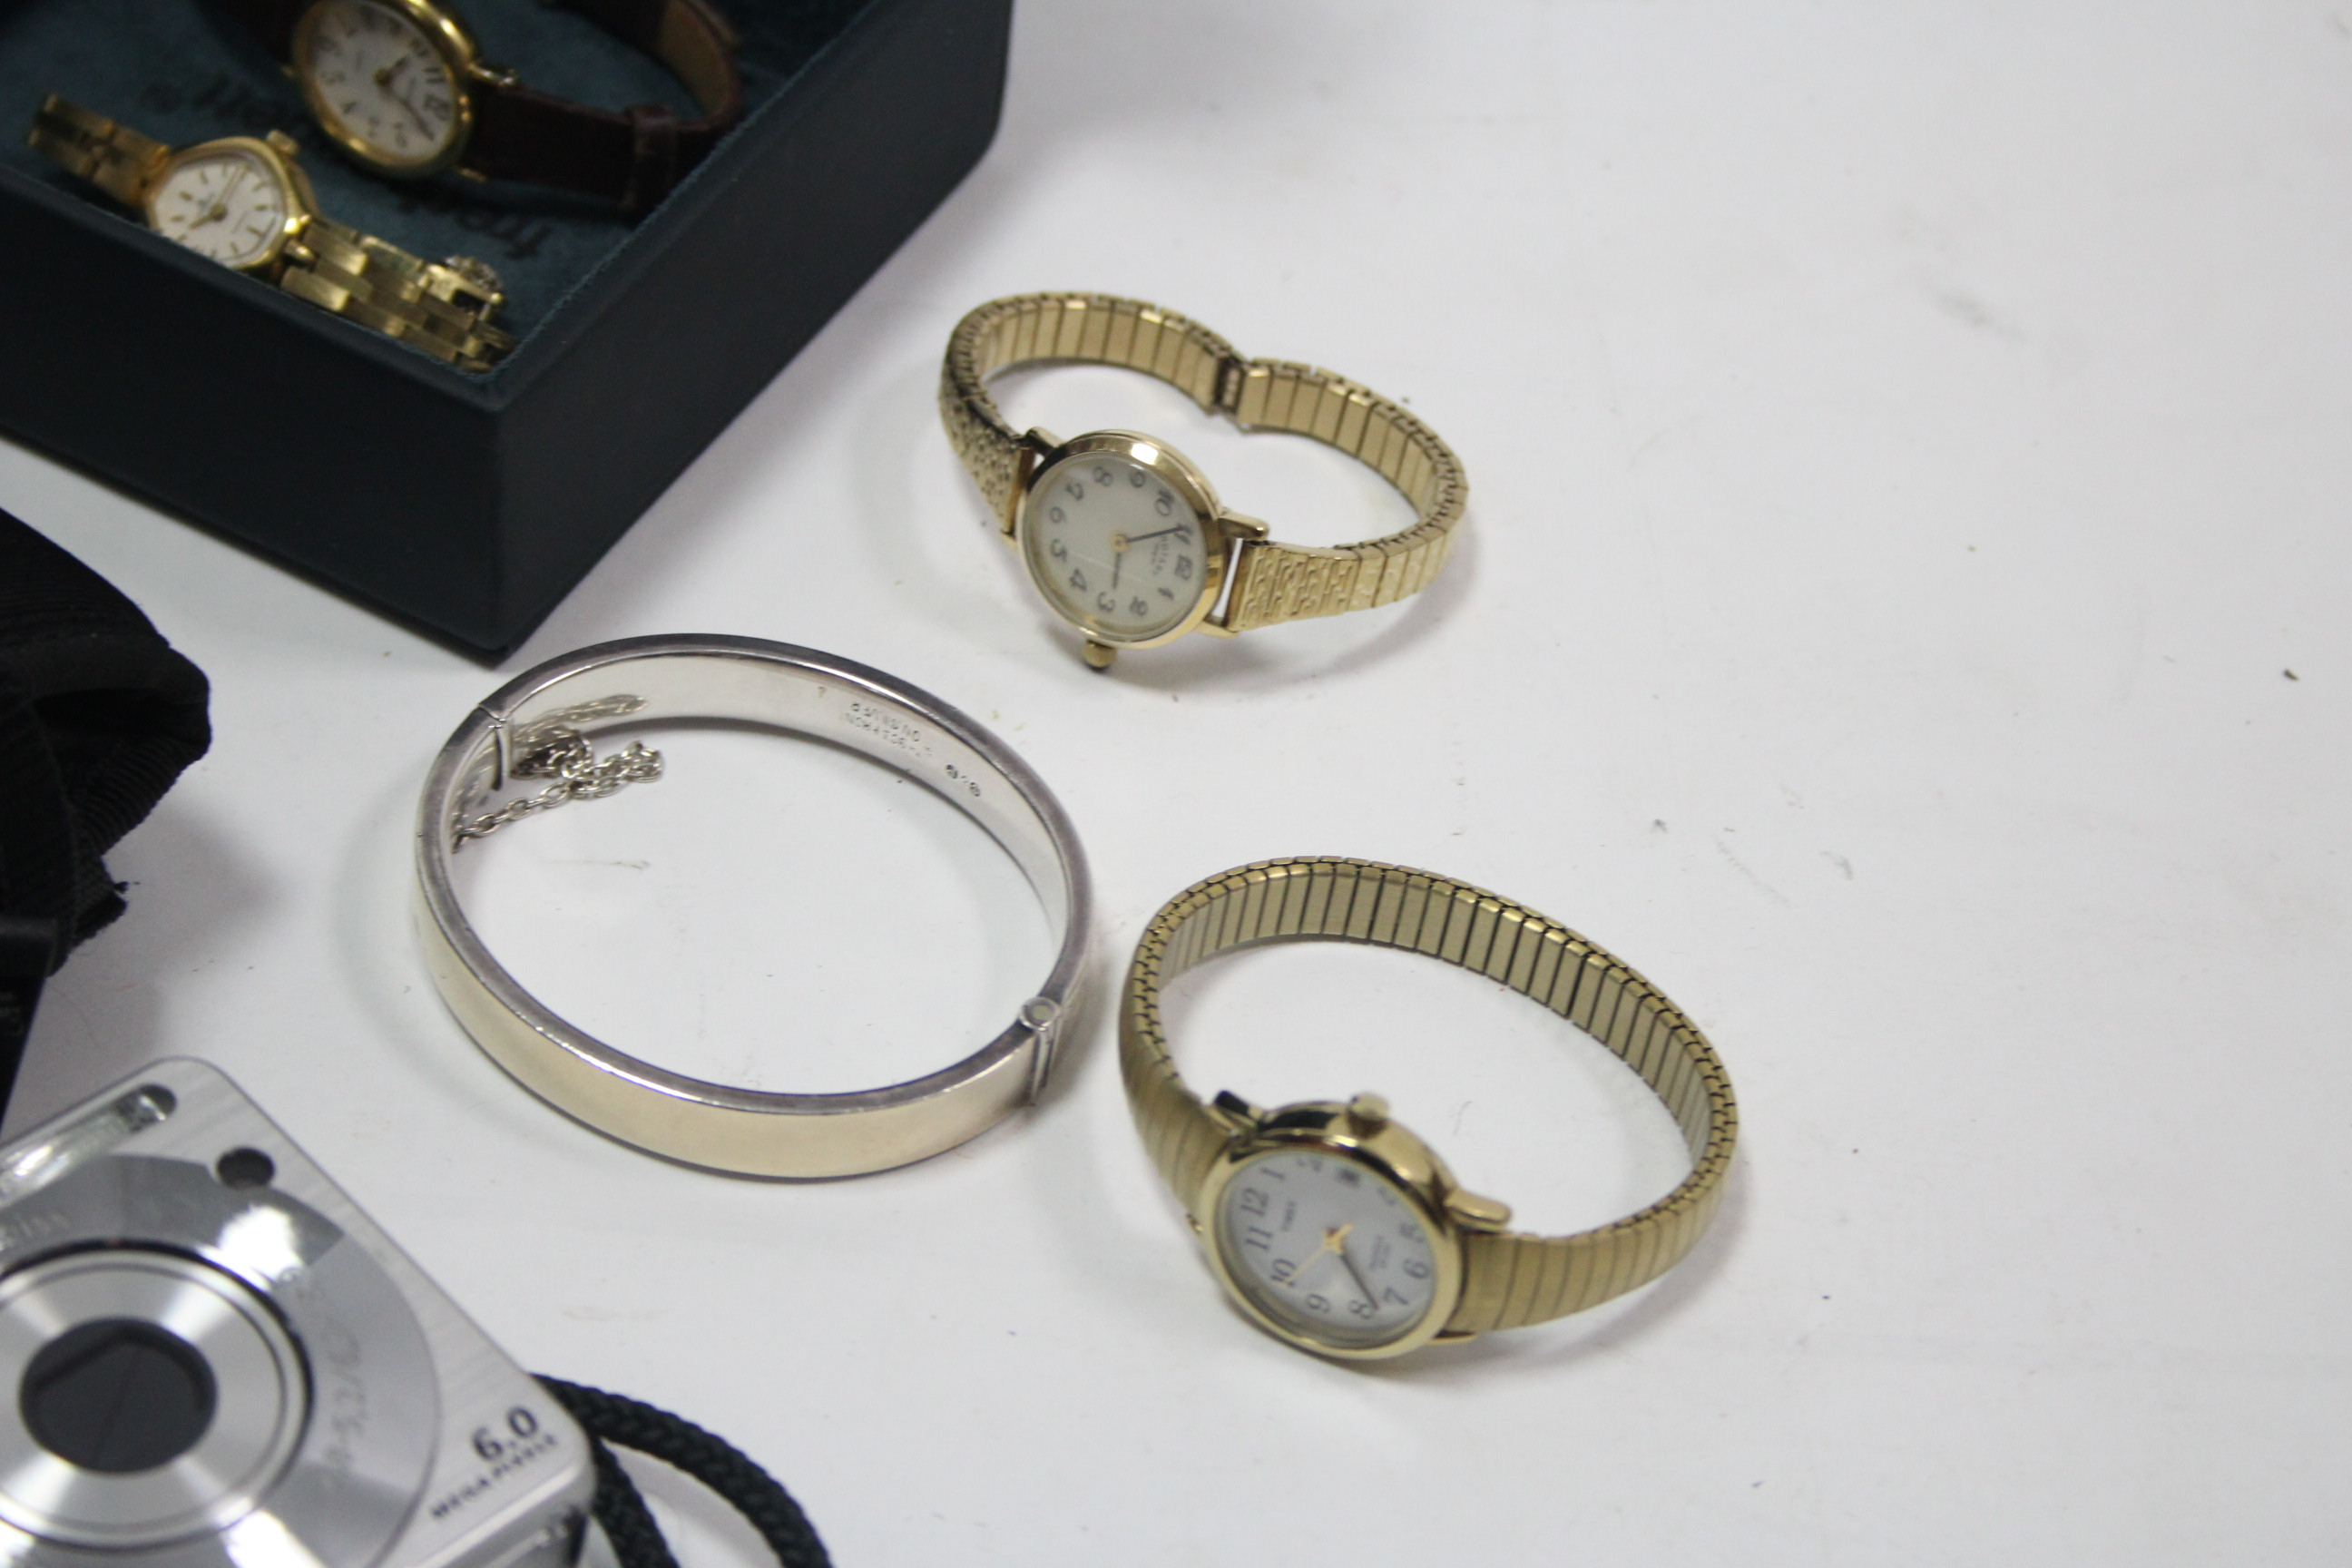 Lot 126 - A Tom-Tom SatNav; two modern cameras; four ladies' wristwatches; & a plated hinged bracelet, etc.